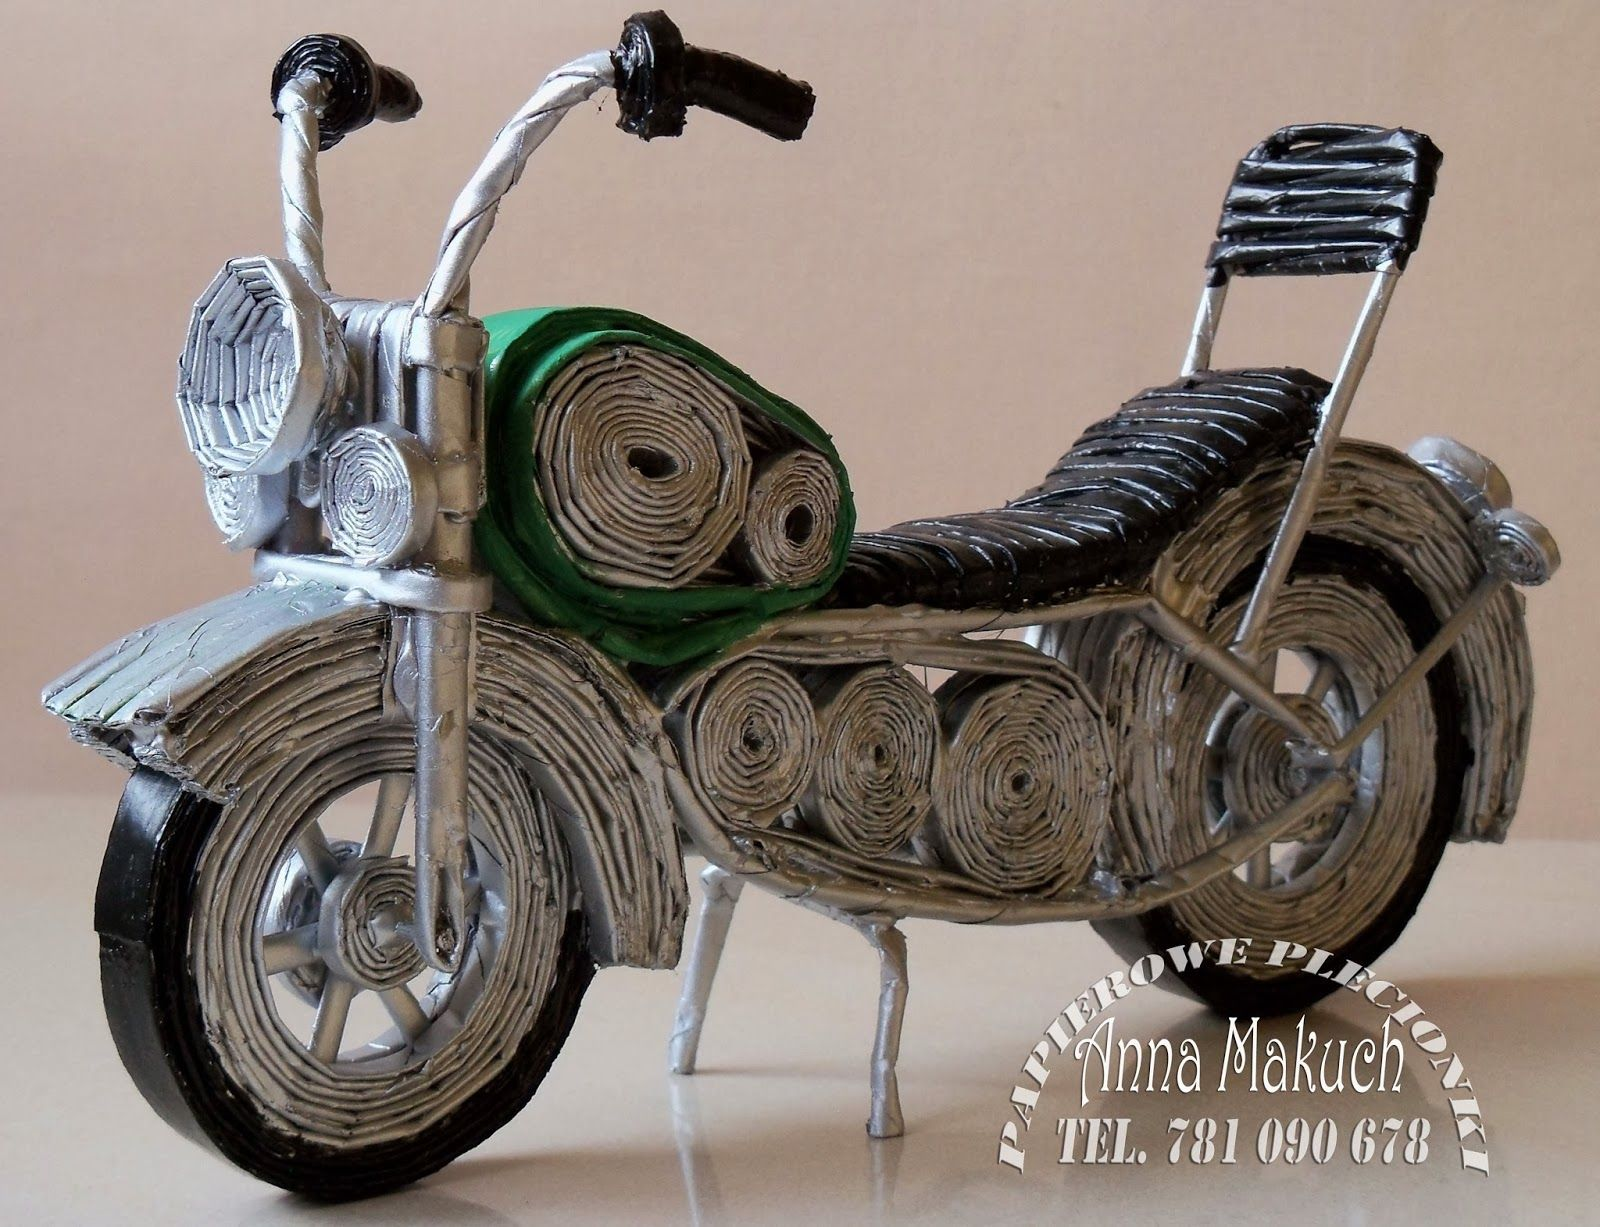 Harley Vel Anney Newspaper Crafts Diy Paper Crafts Diy